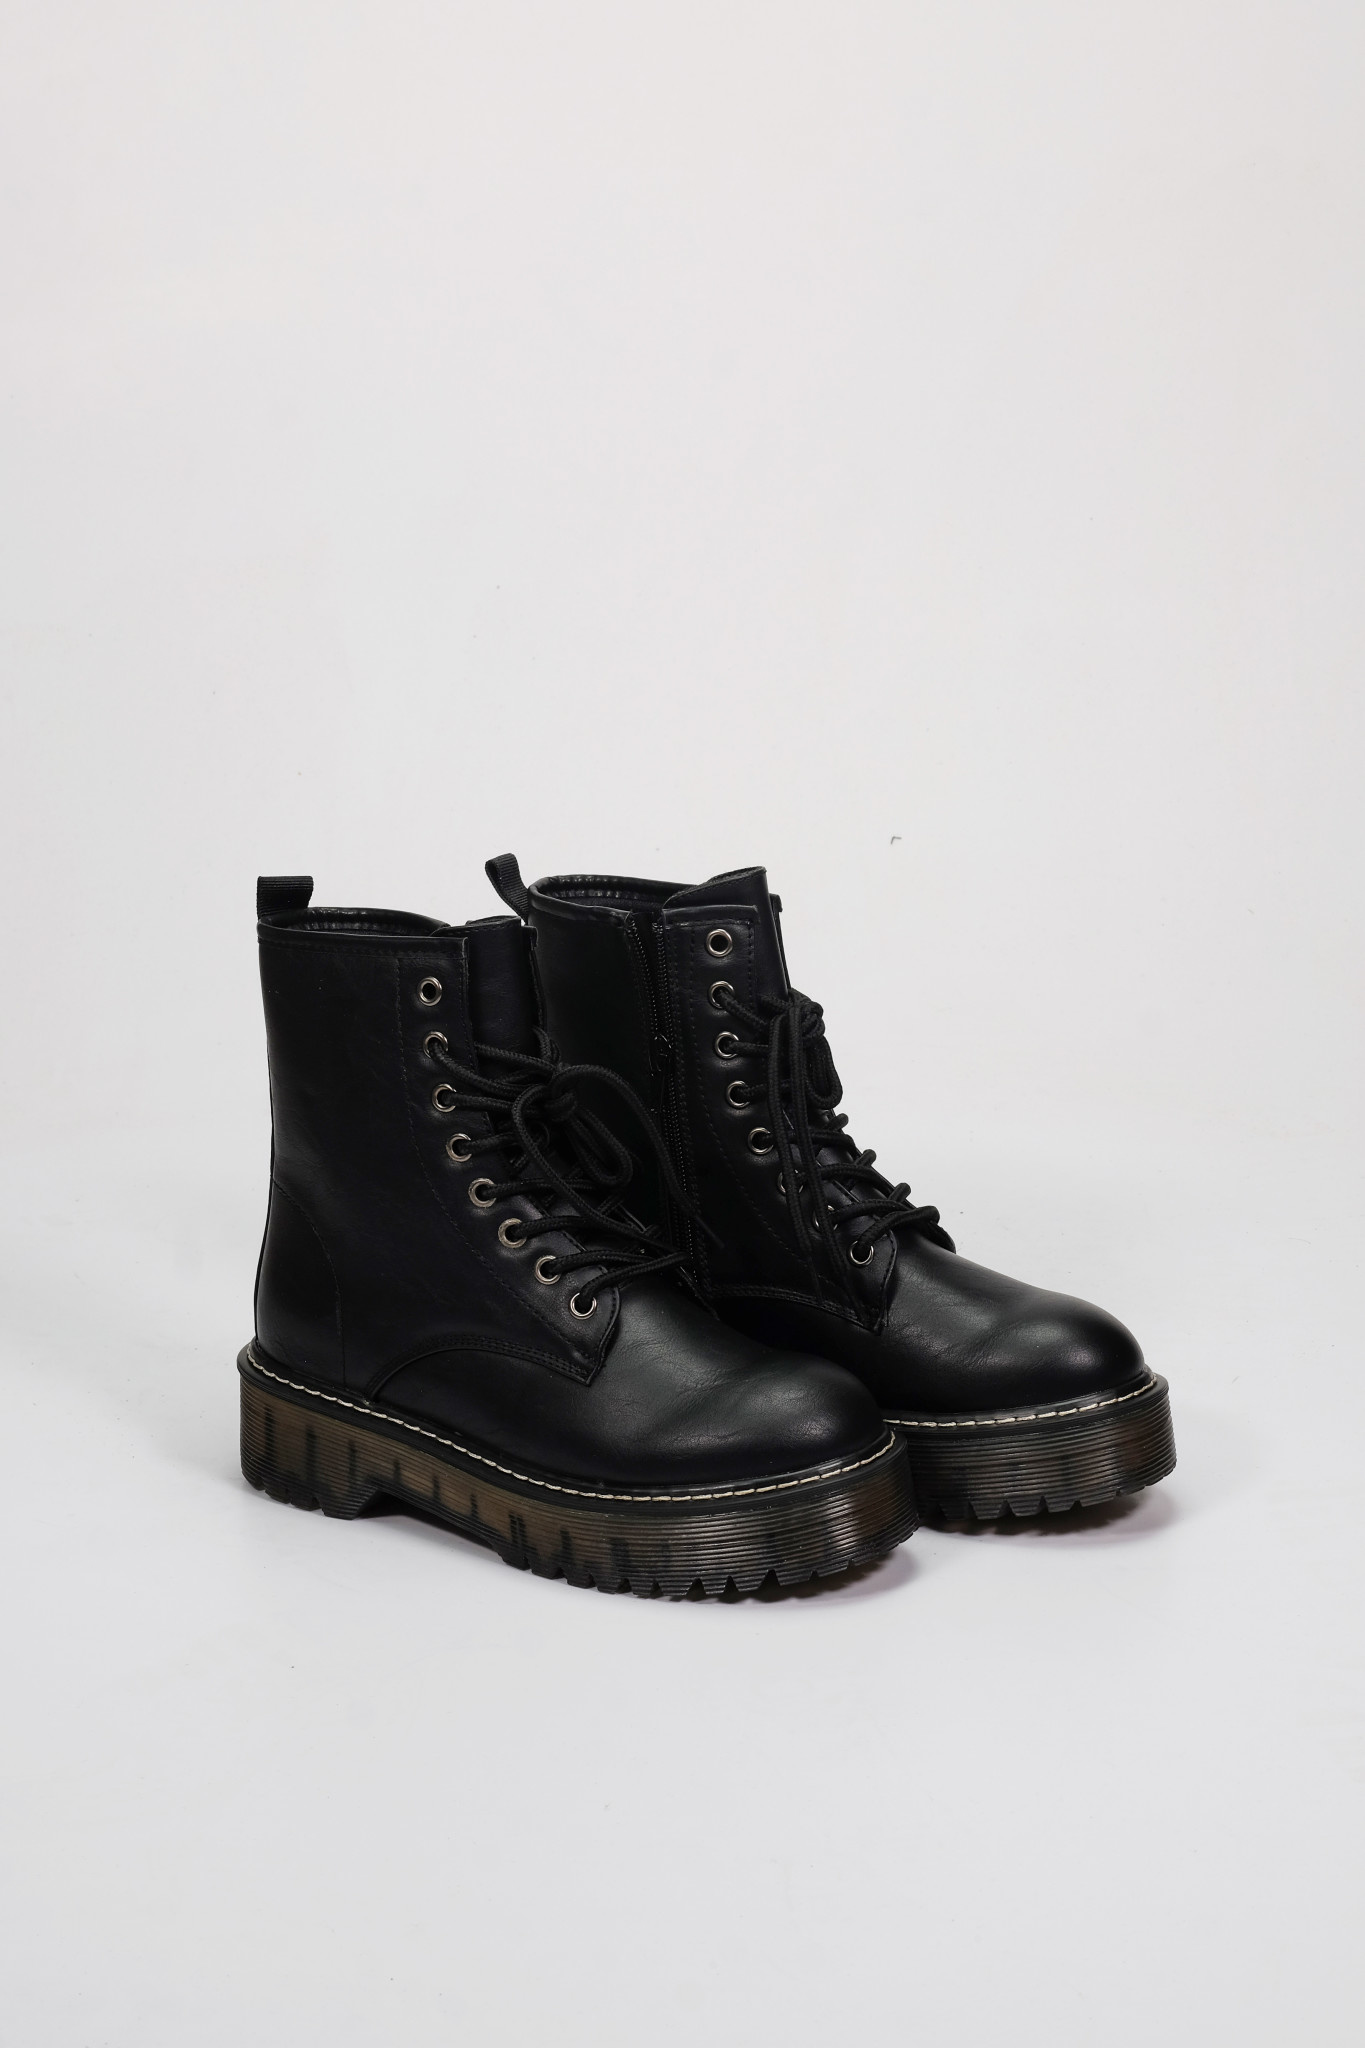 Factory Store Lima Black Soft